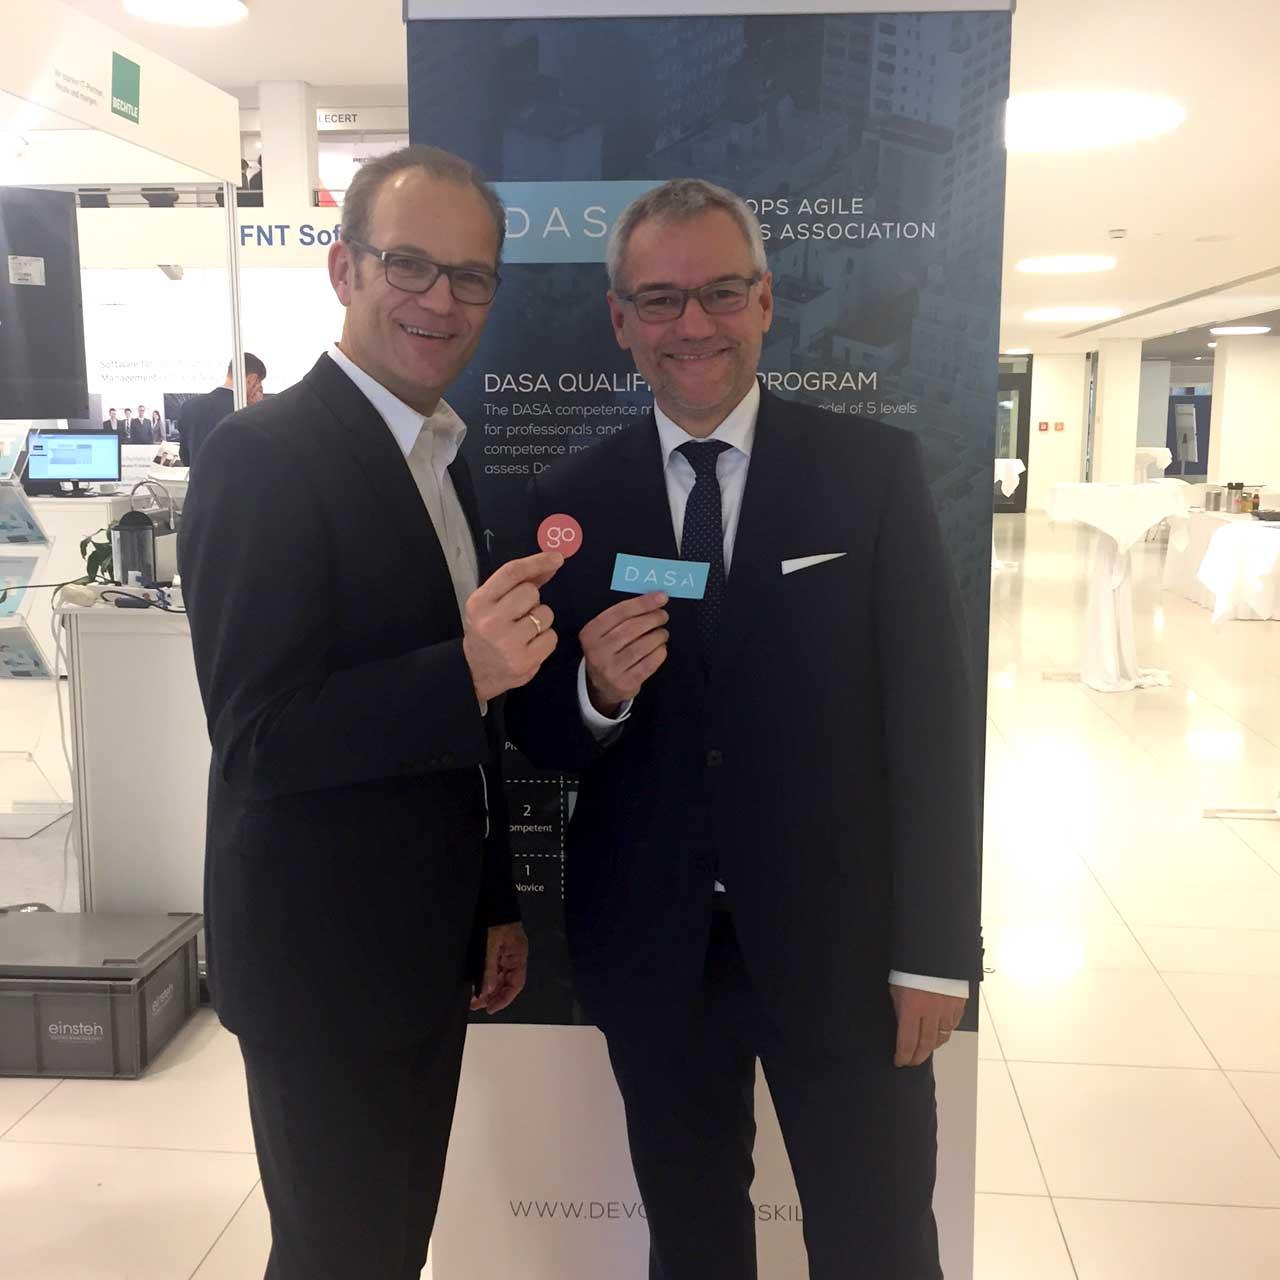 New DASA Ambassadors in Germany -- Markus Bause and Dierk Söllner.